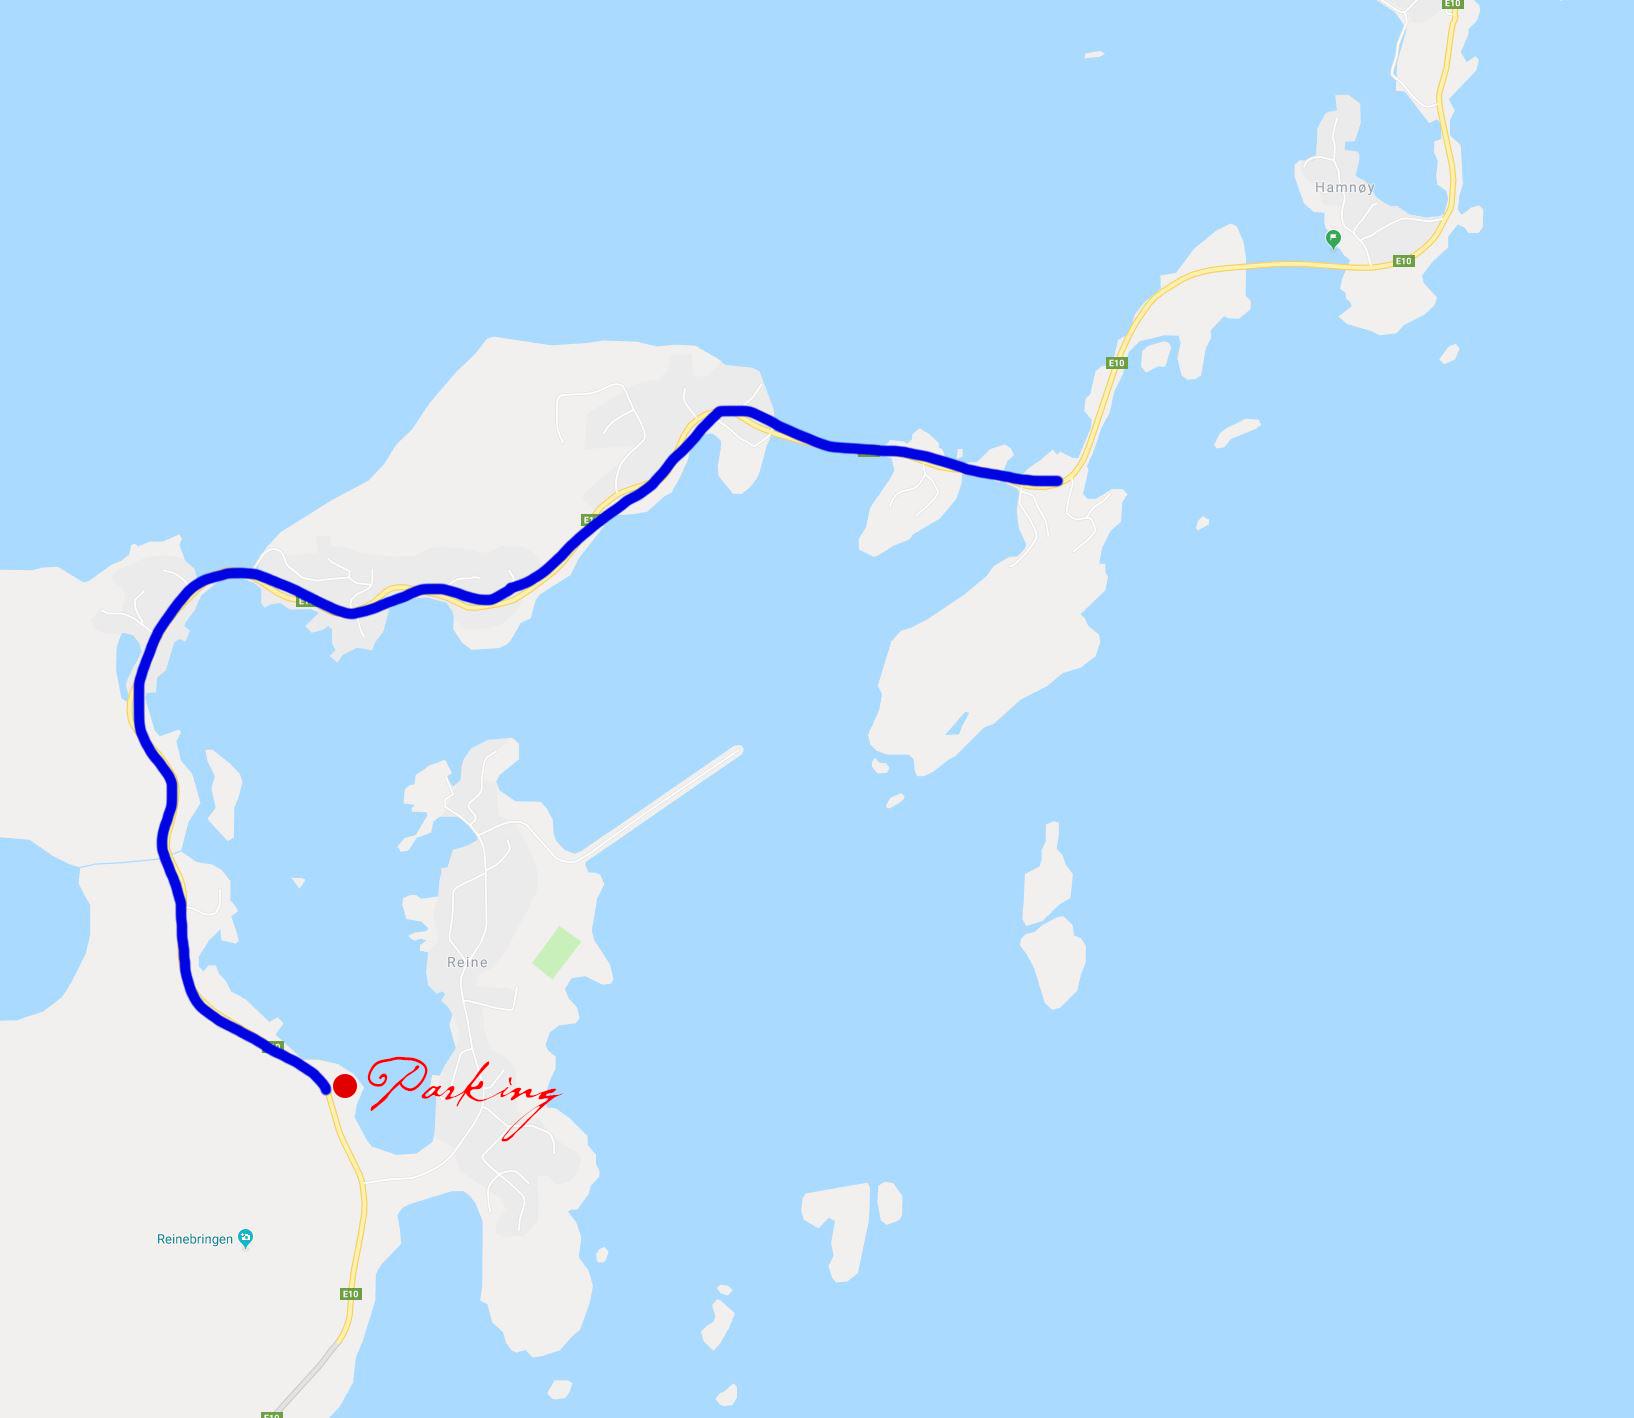 A great walk through the old villages of Hamnøy, Reine and Sakrisøy